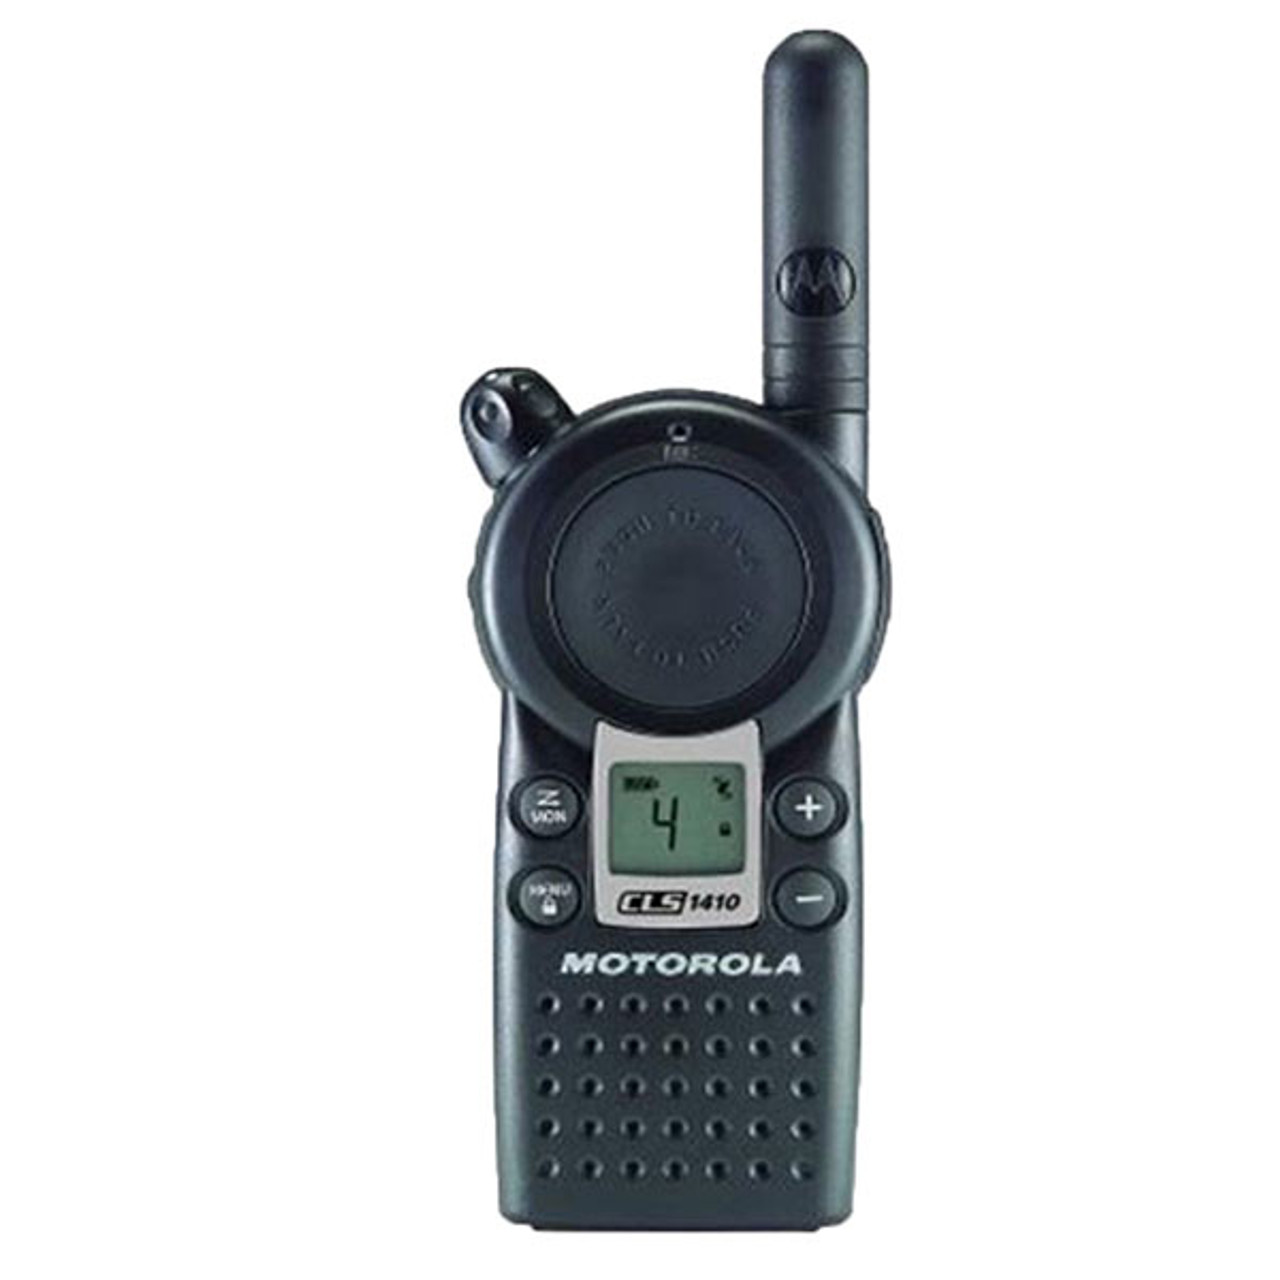 Motorola CLS1410 1 Watt 4 Channel UHF two way radio